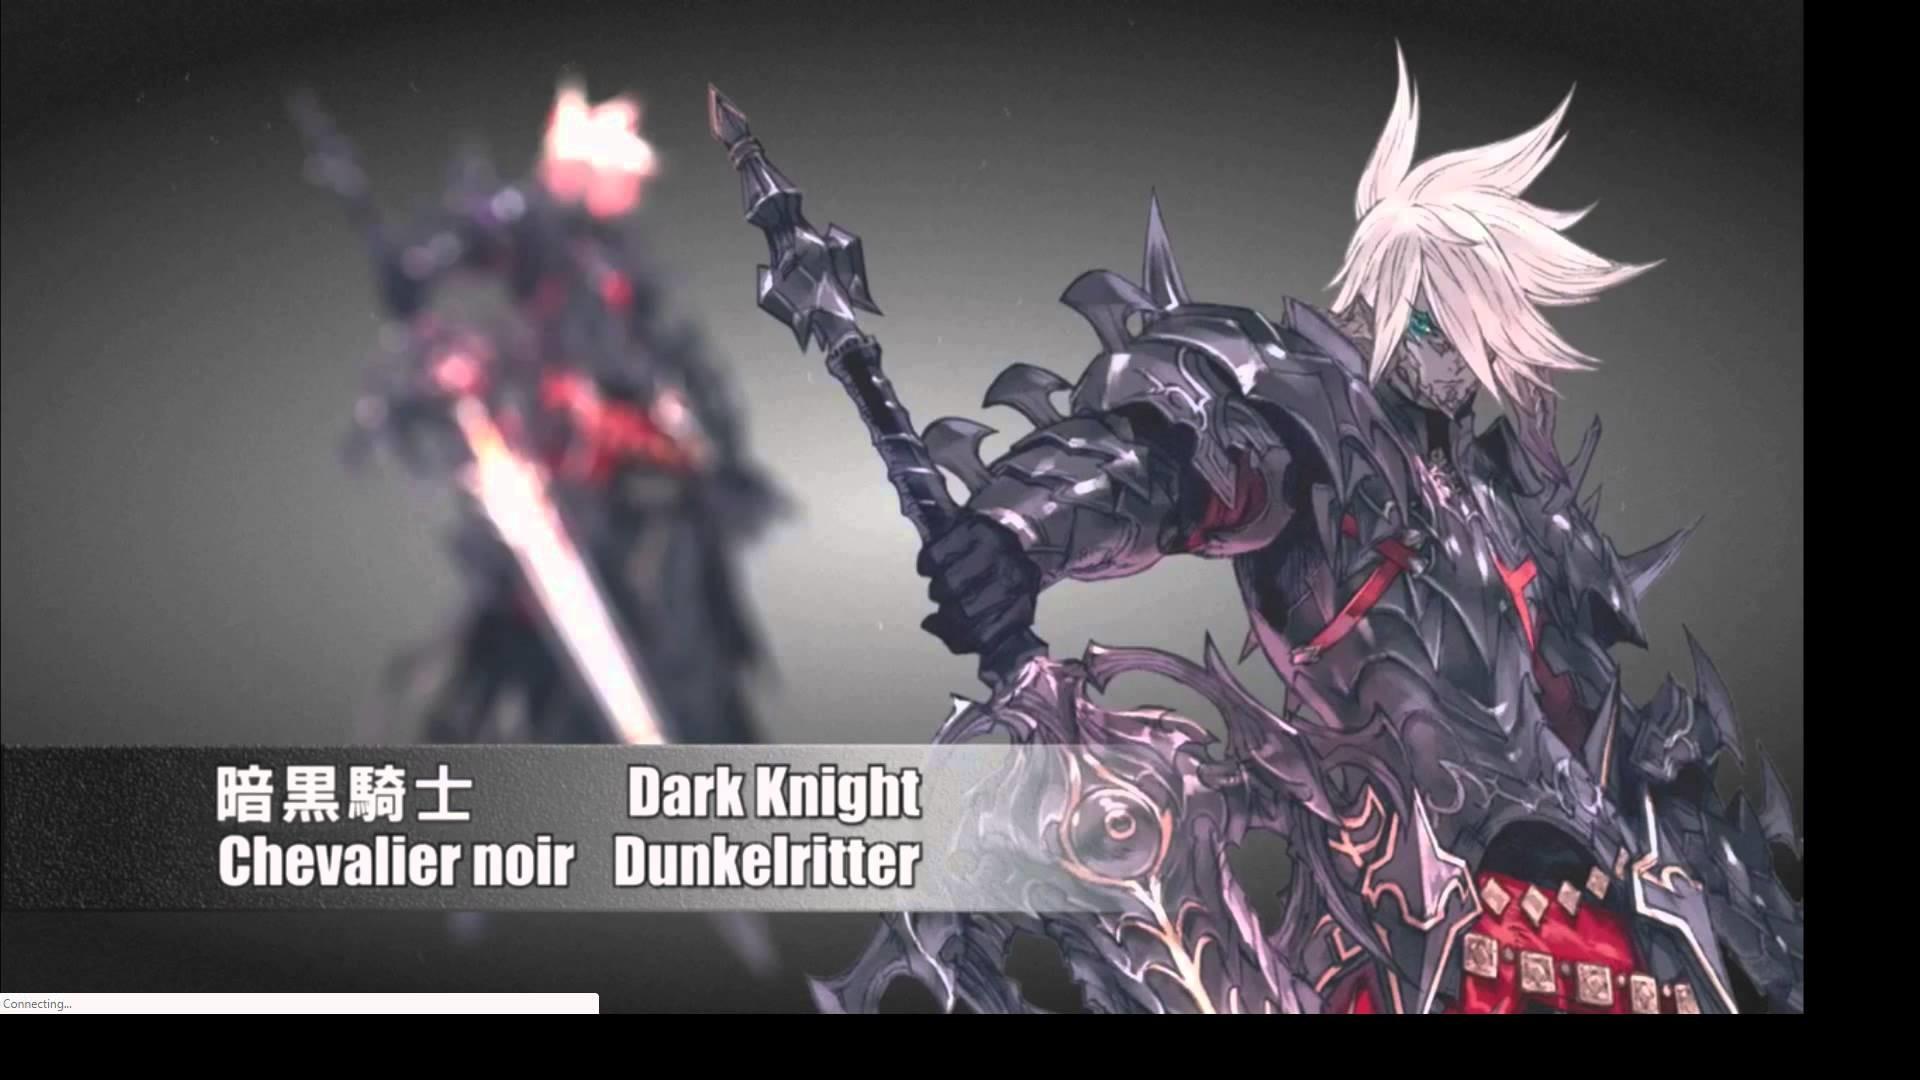 FFXIV Dark Knight Skills/Actions Video